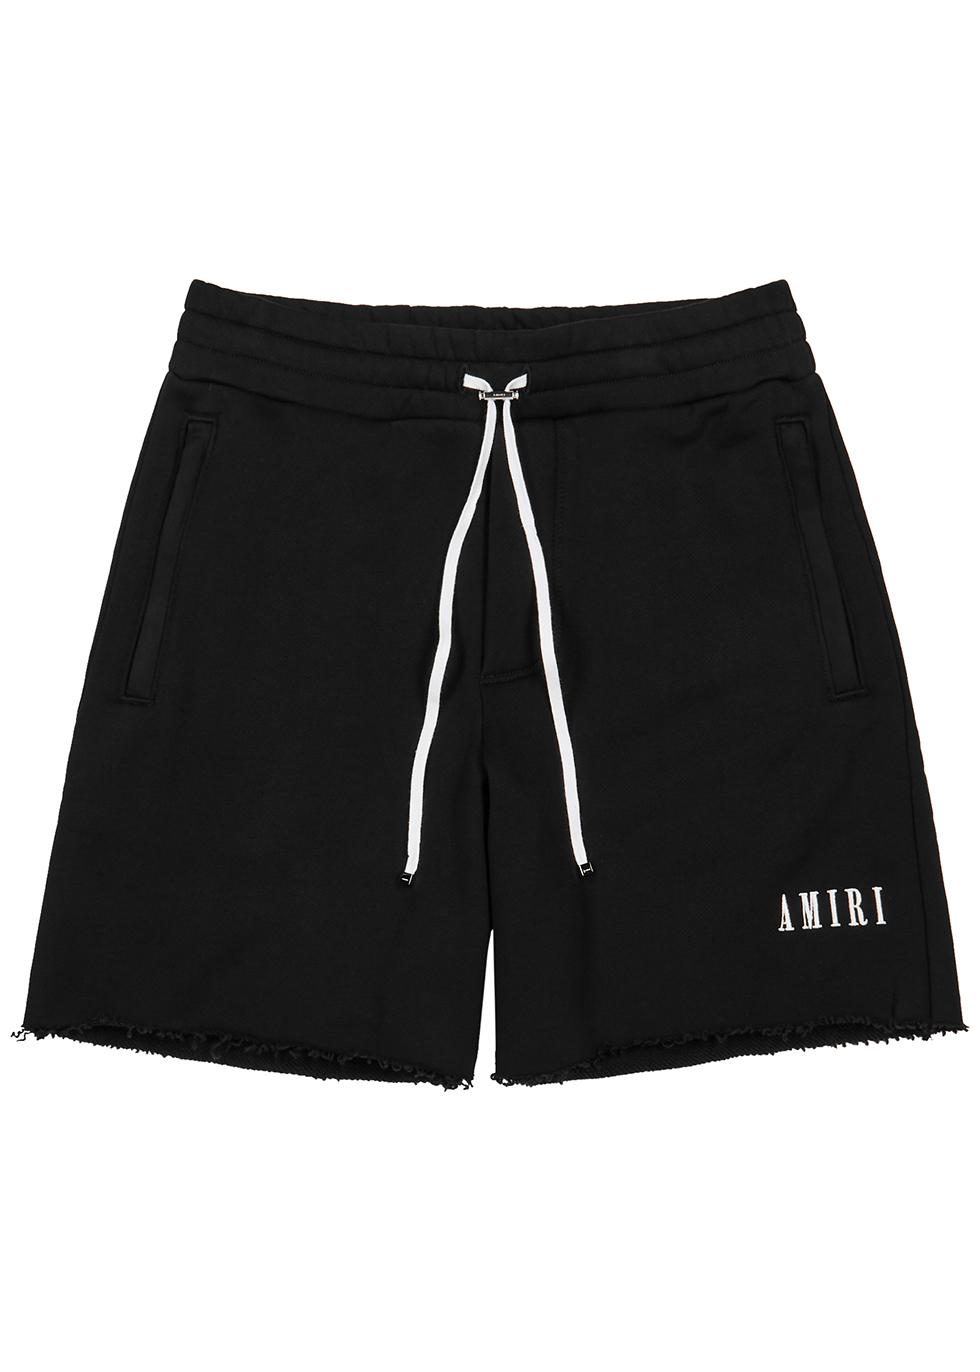 Black cotton-jersey shorts